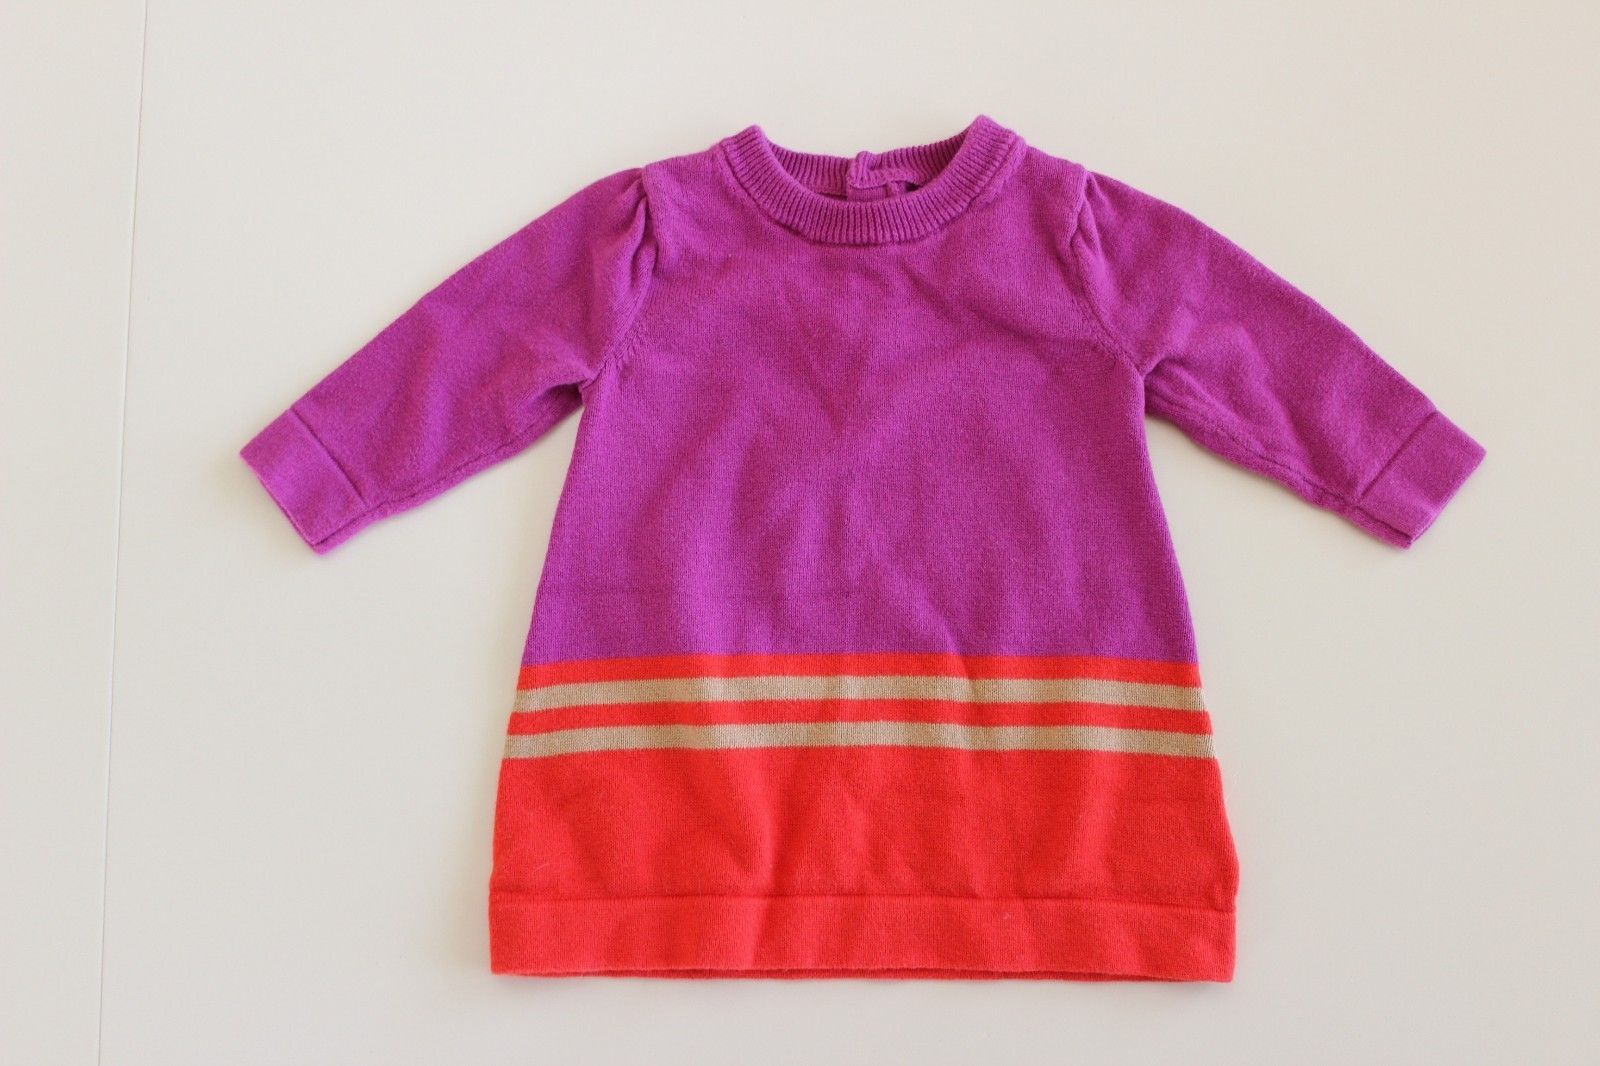 4ebff9b9f Baby Gap 0-3 M Girl Top Tunic Shirt Dress and 50 similar items